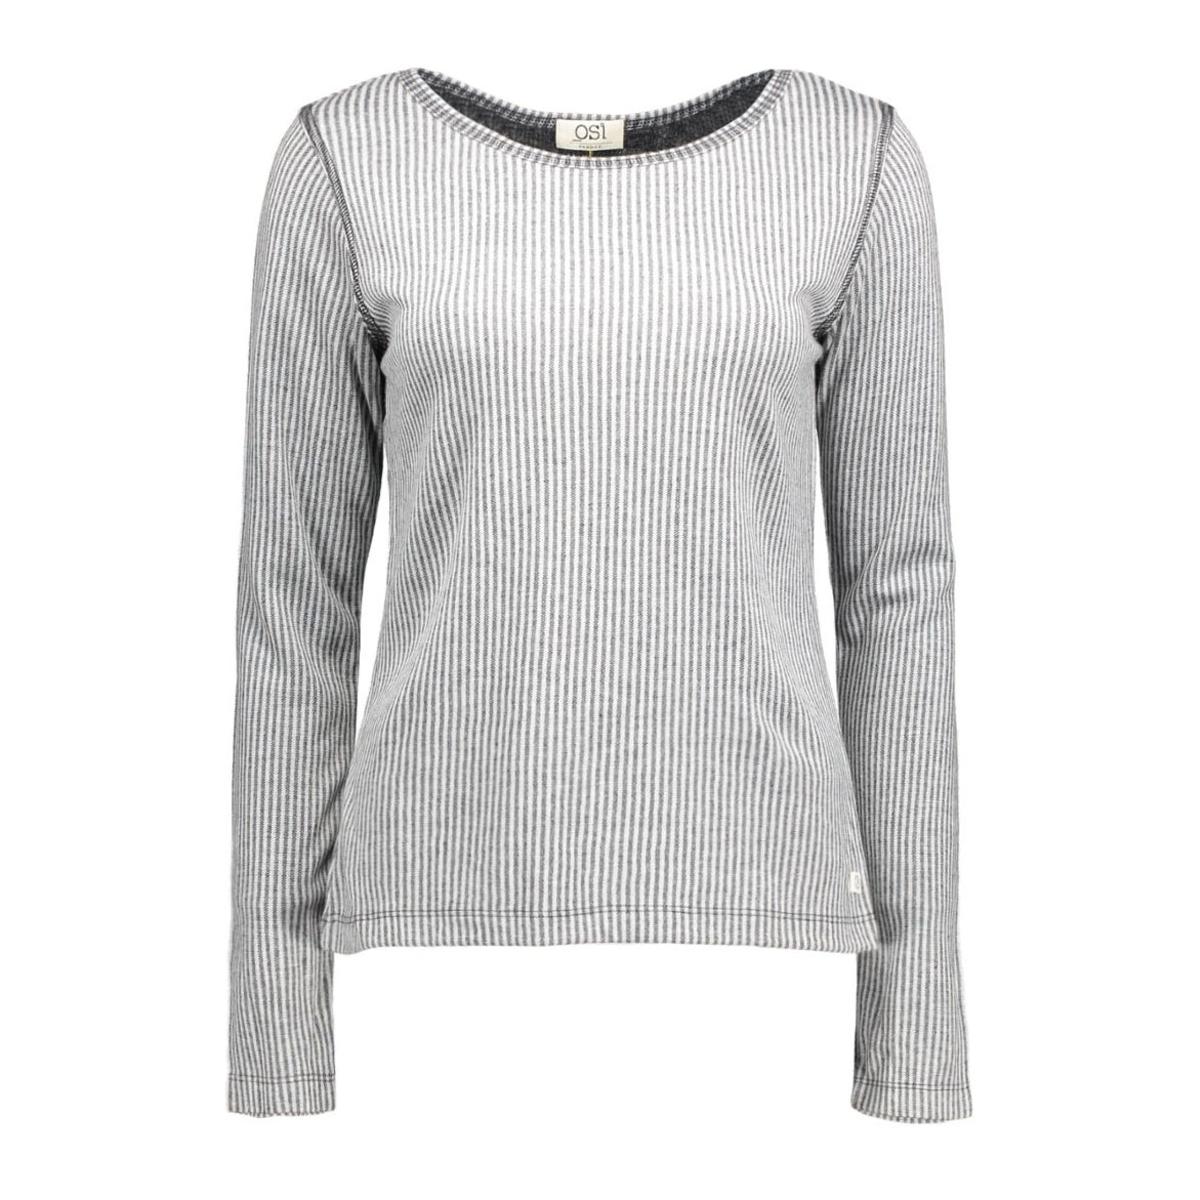 megan stripe osi femmes t-shirt dark grey